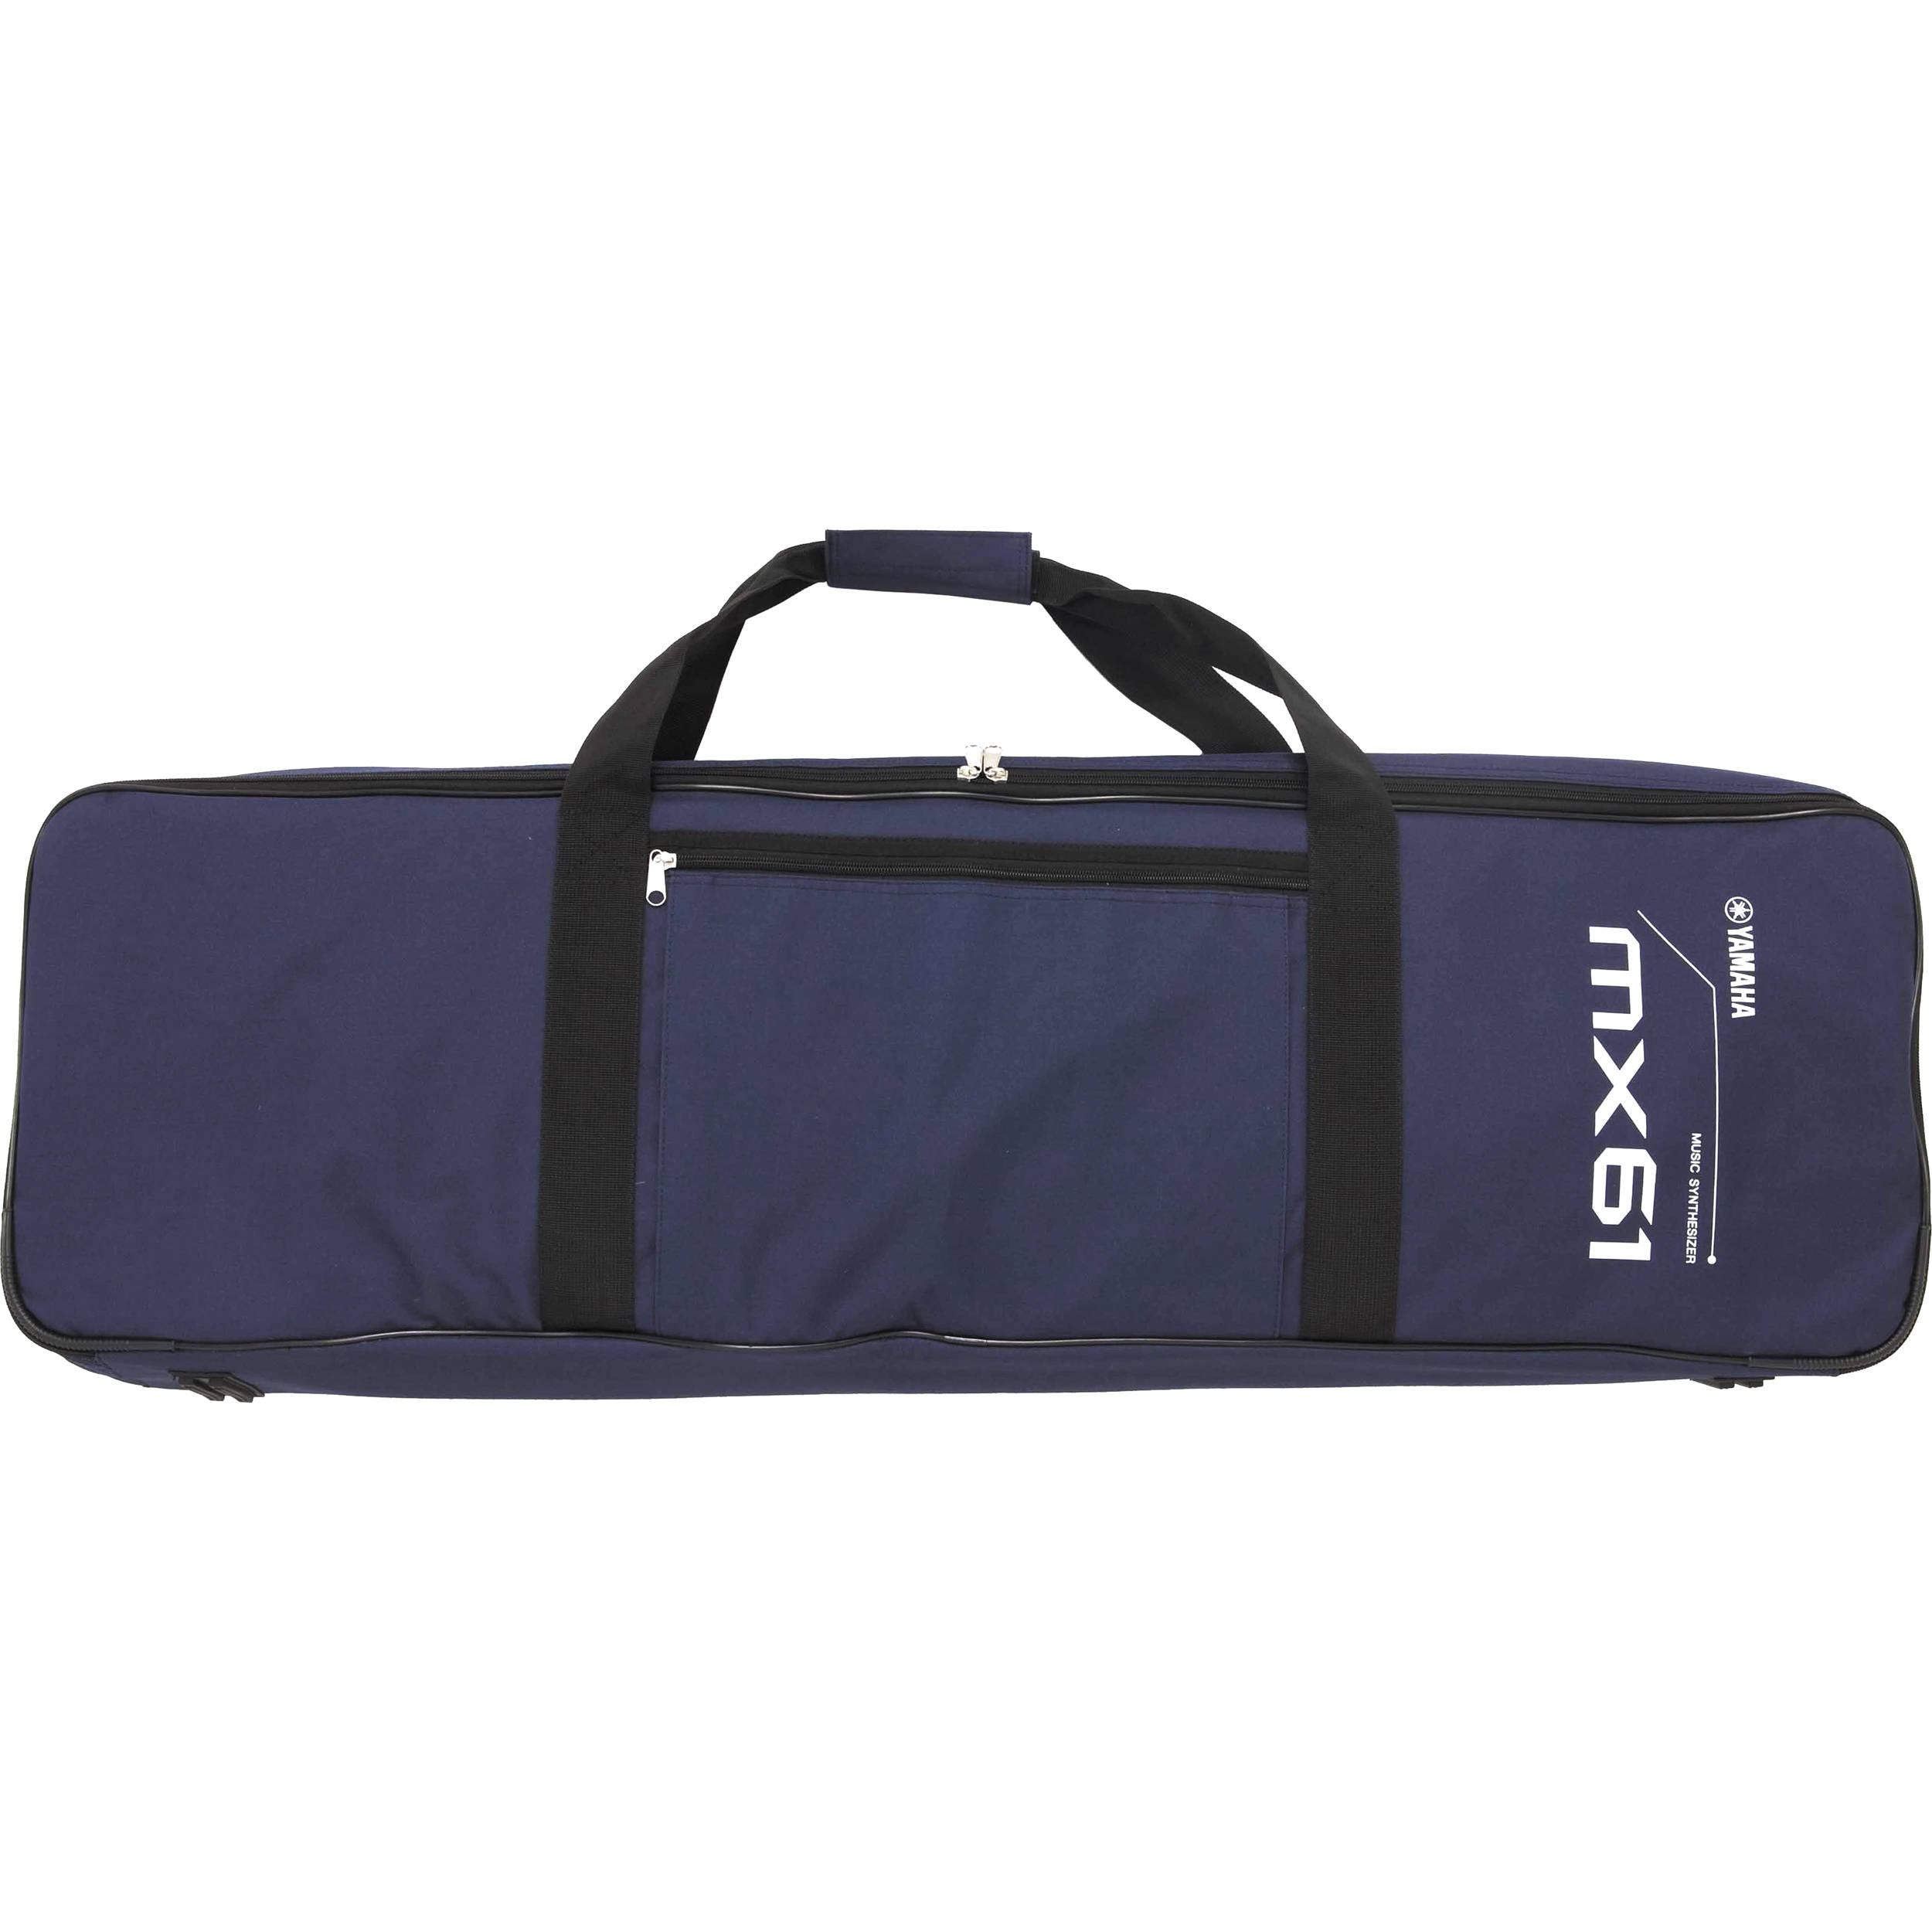 Yamaha mx61 bag for mx61 music synthesizer blue mx61 bag for Yamaha mx61 specs